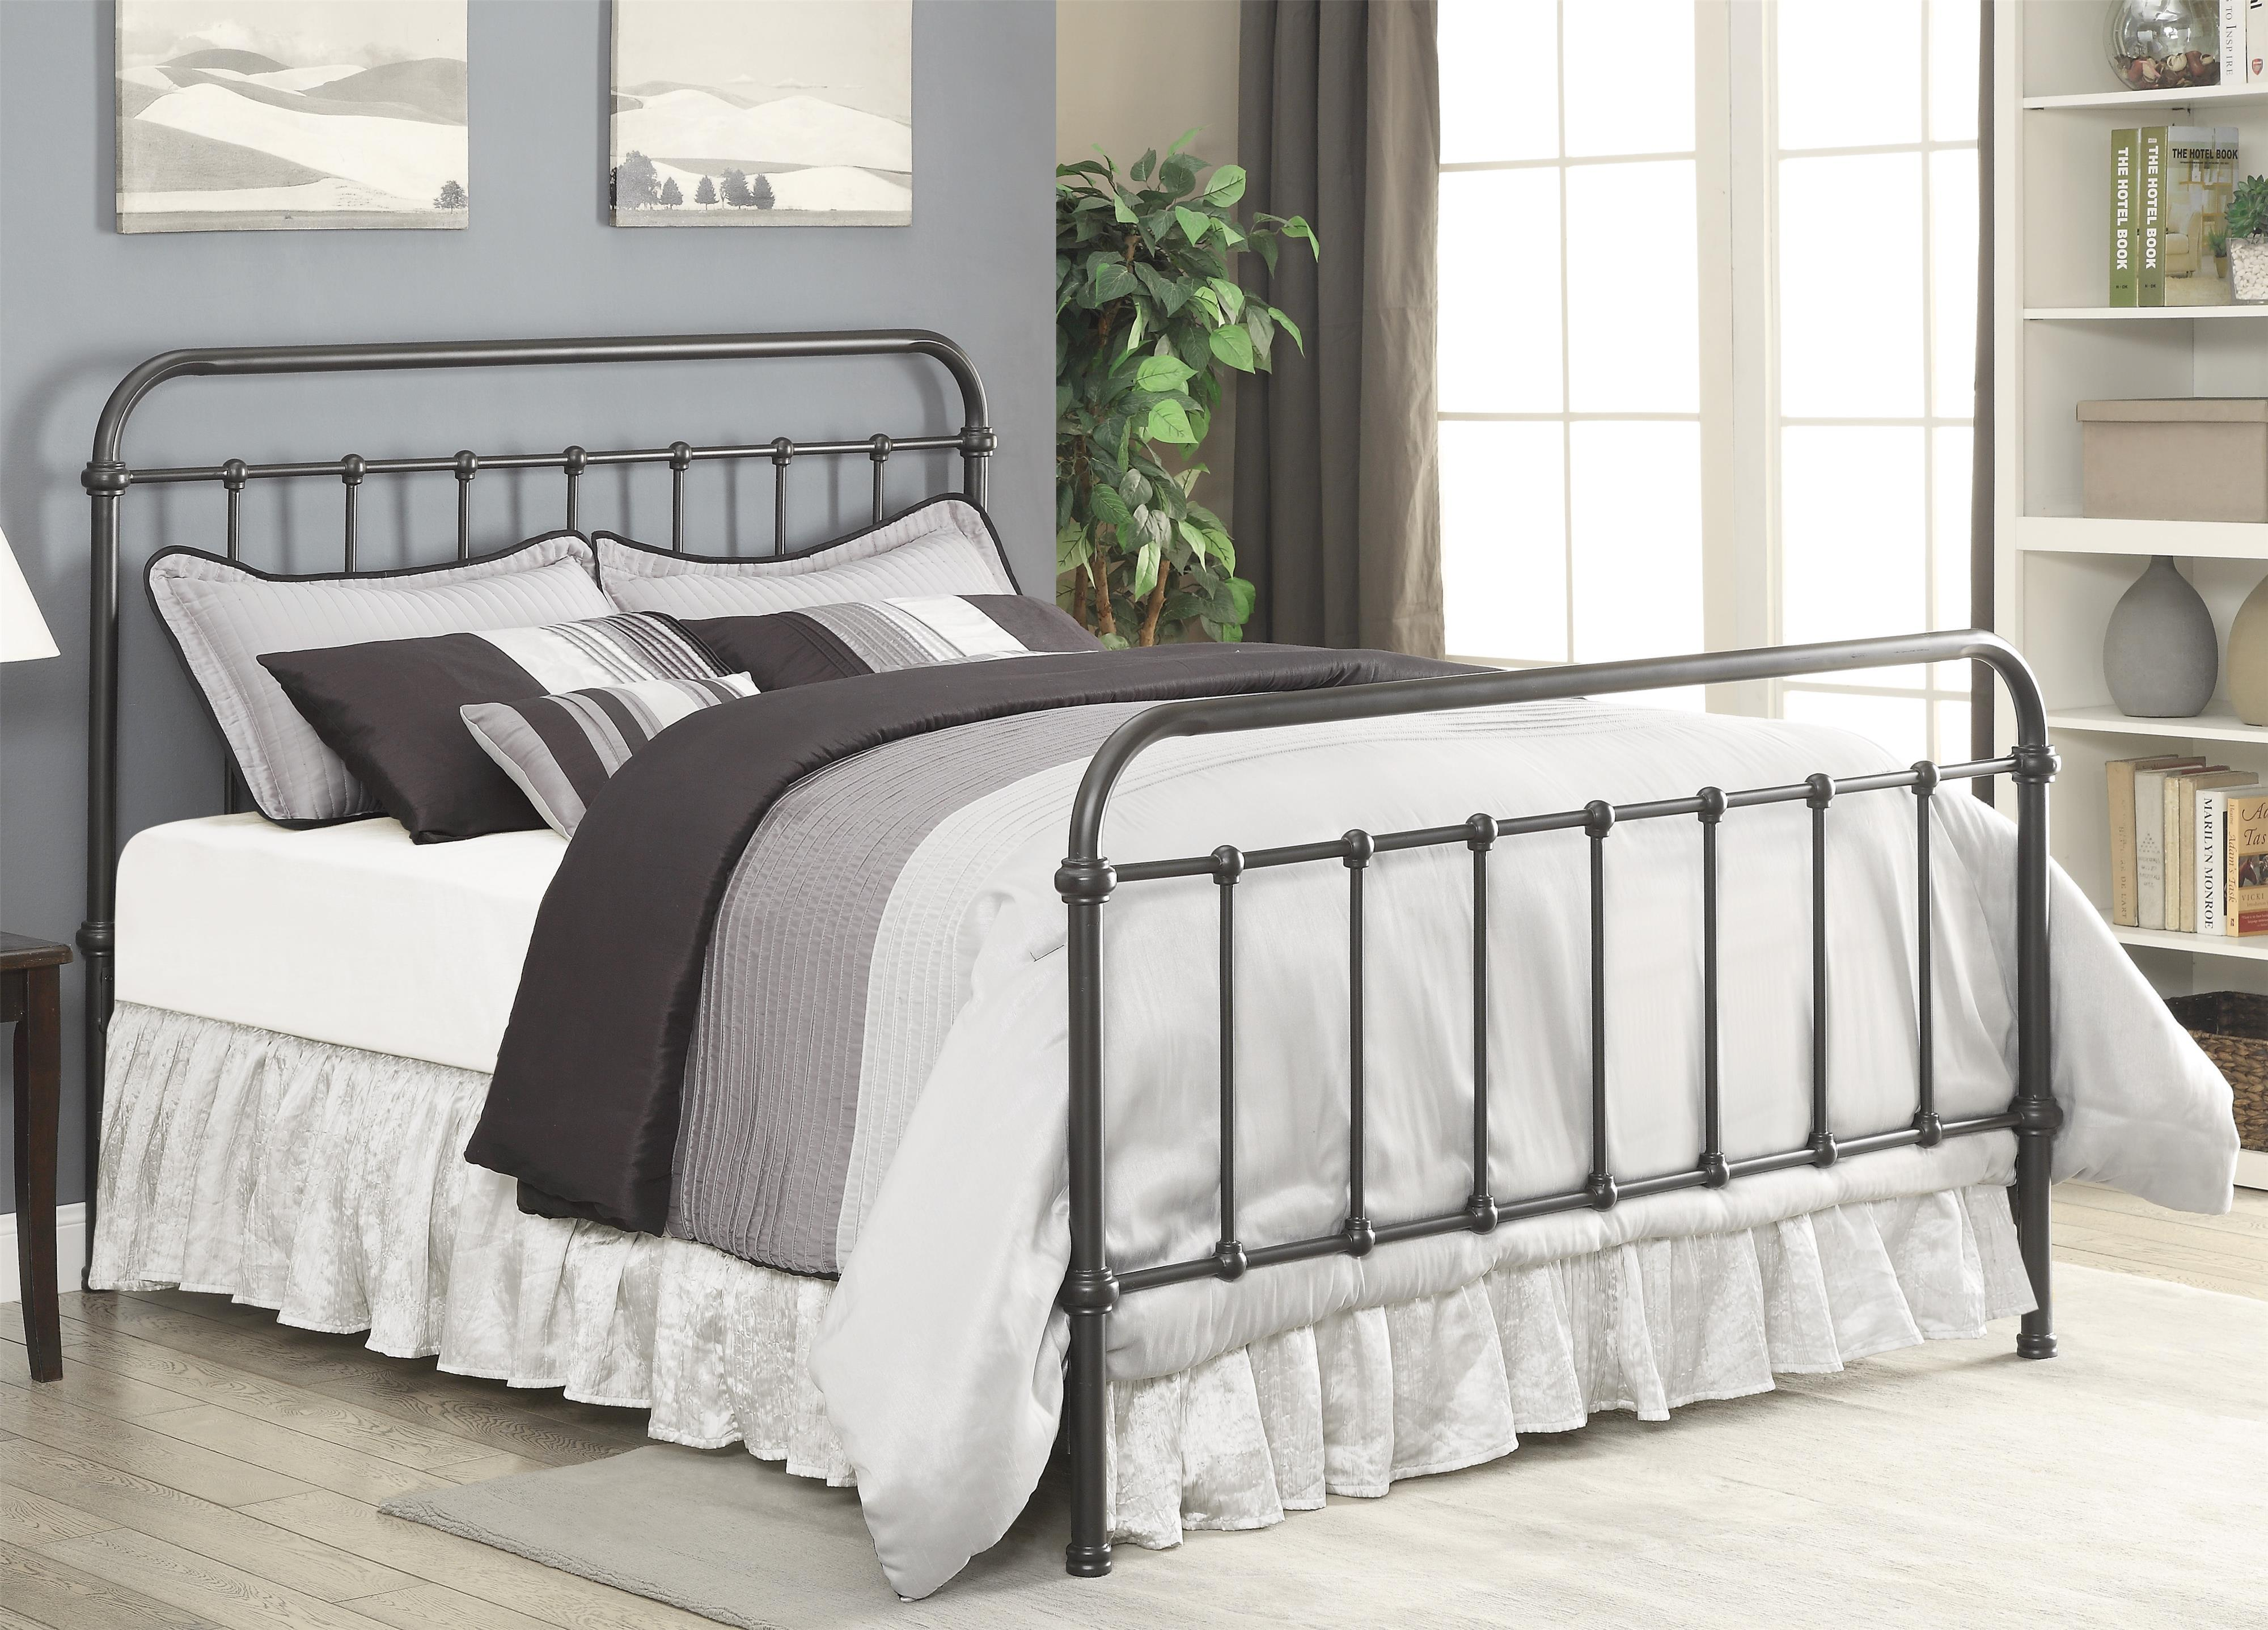 coaster livingston 300399kw transitional california king metal bed dunk bright furniture. Black Bedroom Furniture Sets. Home Design Ideas